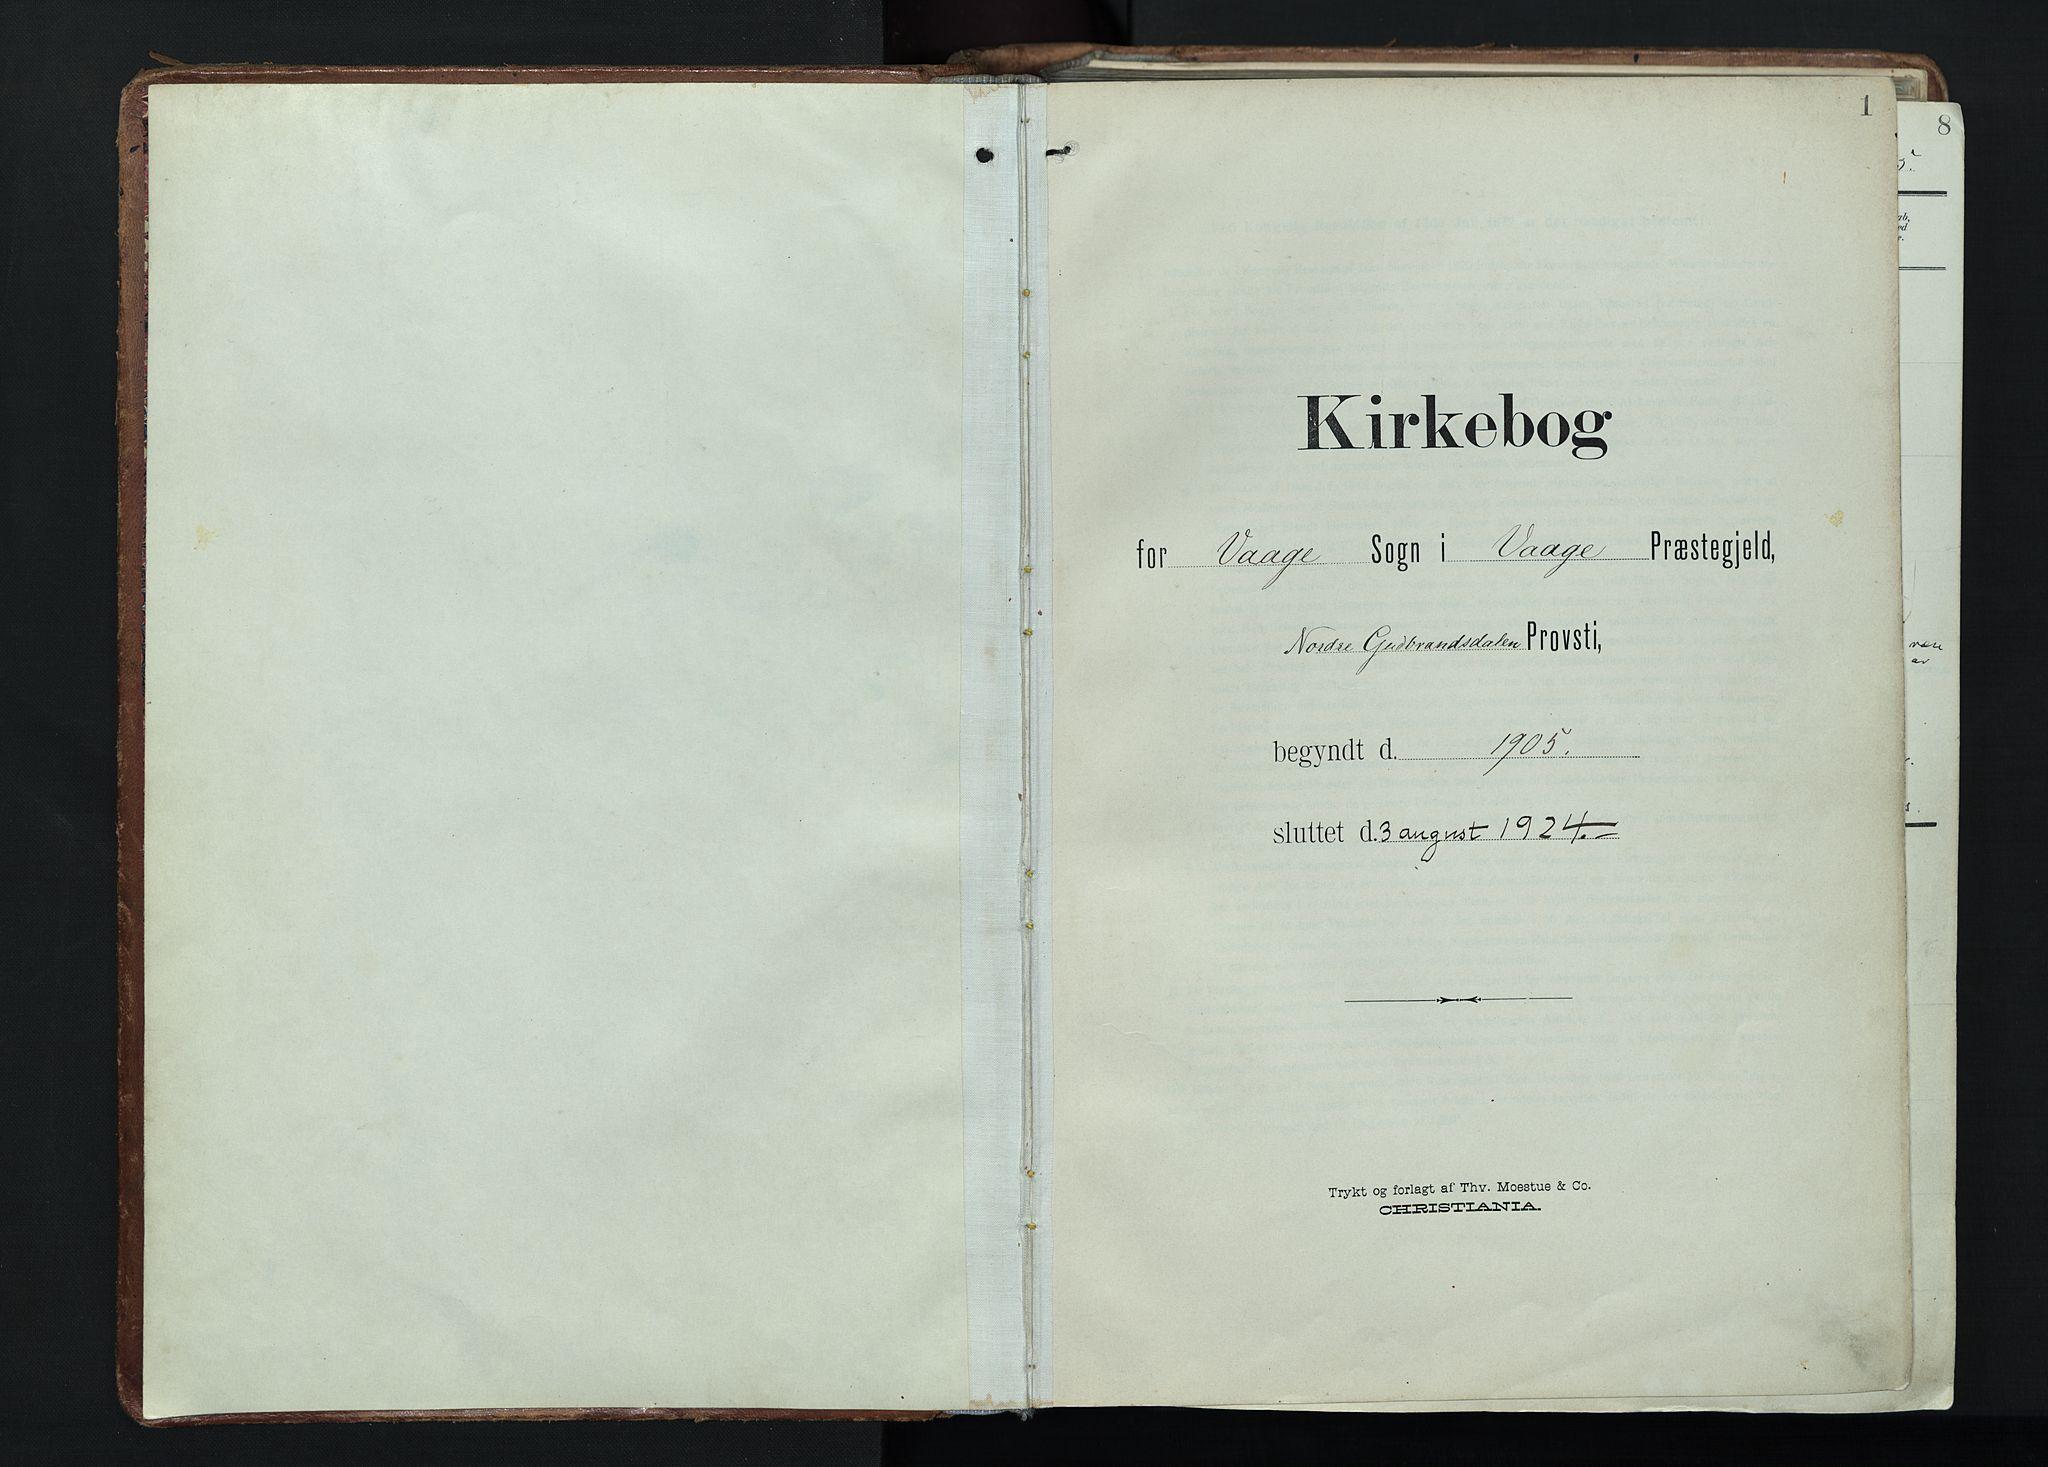 SAH, Vågå prestekontor, Ministerialbok nr. 11, 1905-1924, s. 1